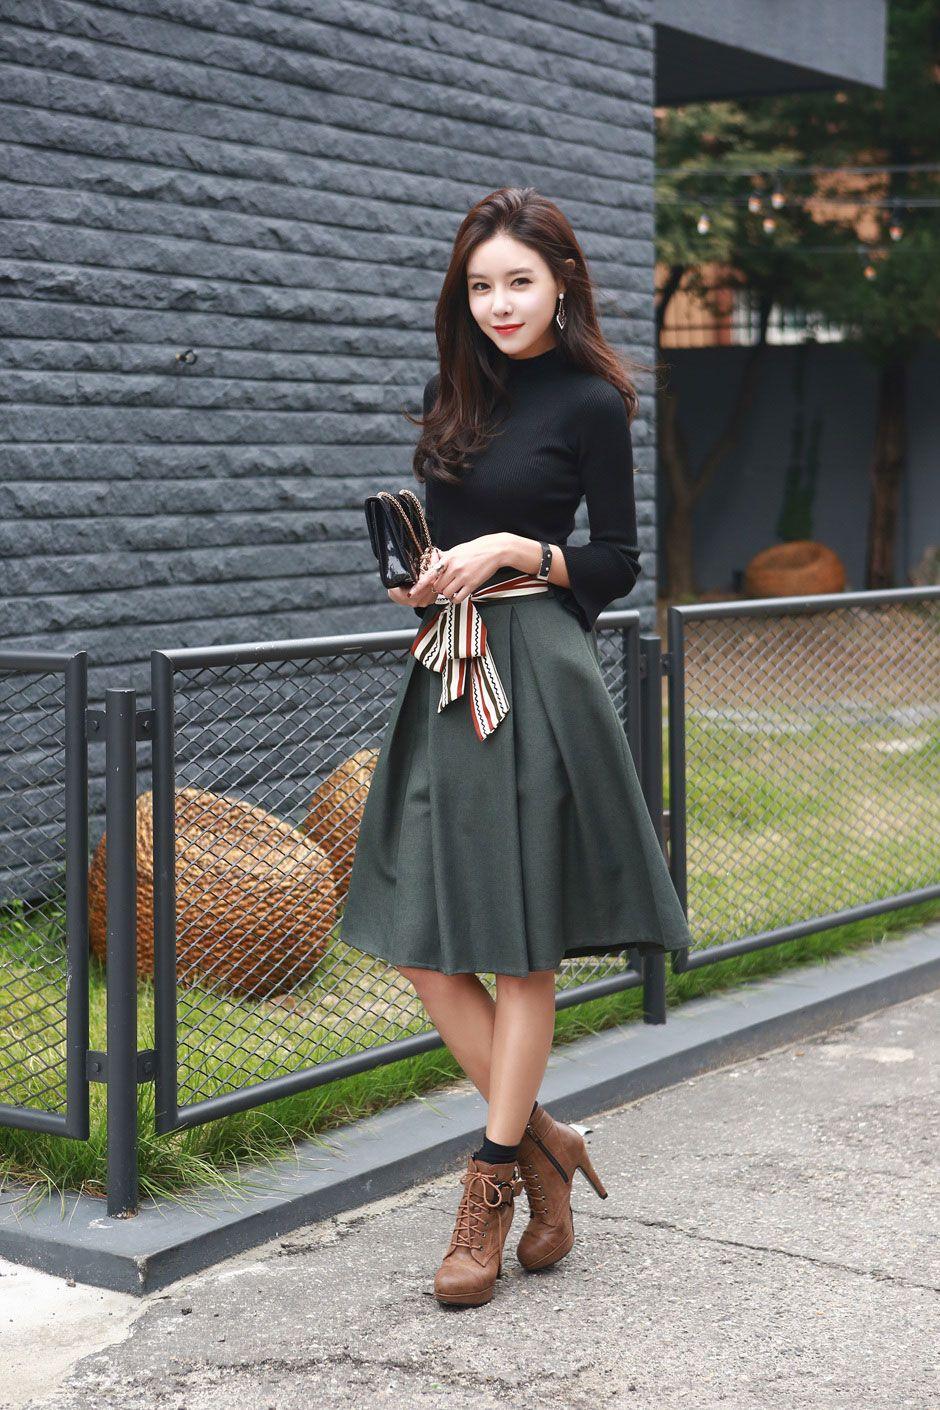 0c9c1c0d7 Falda plisada verde blusa negra cuello alto botines cafes calcetas negras